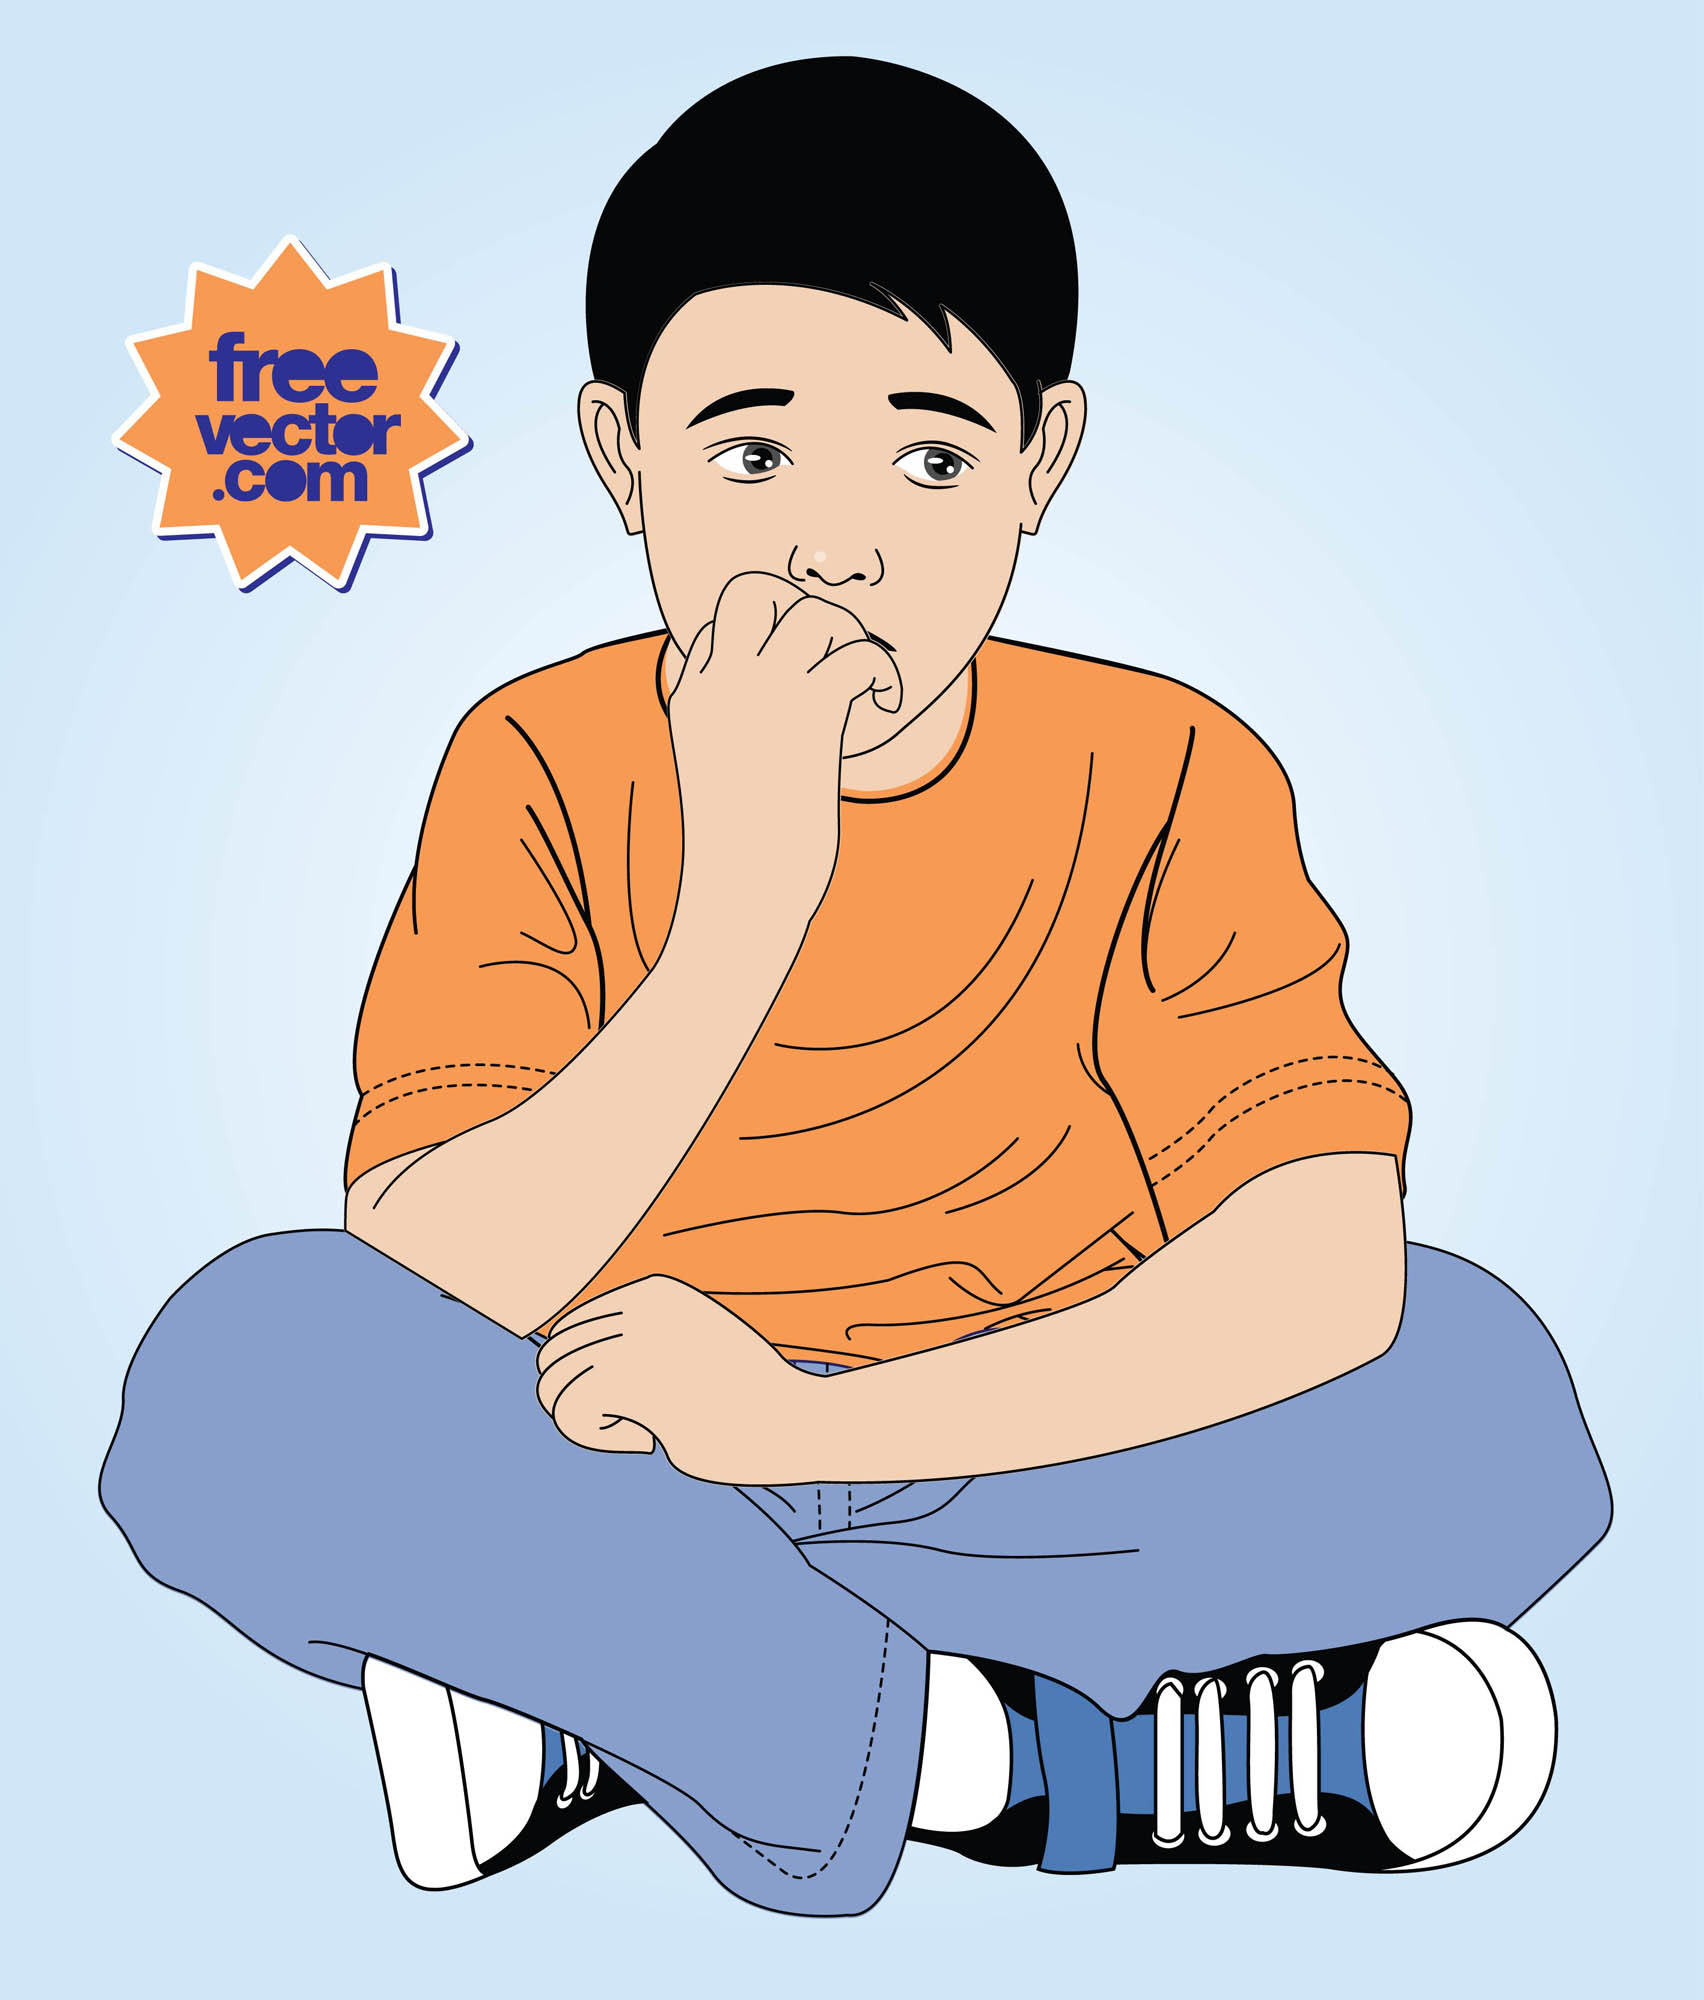 Anxious Kid Vector Art & Graphics | freevector.com